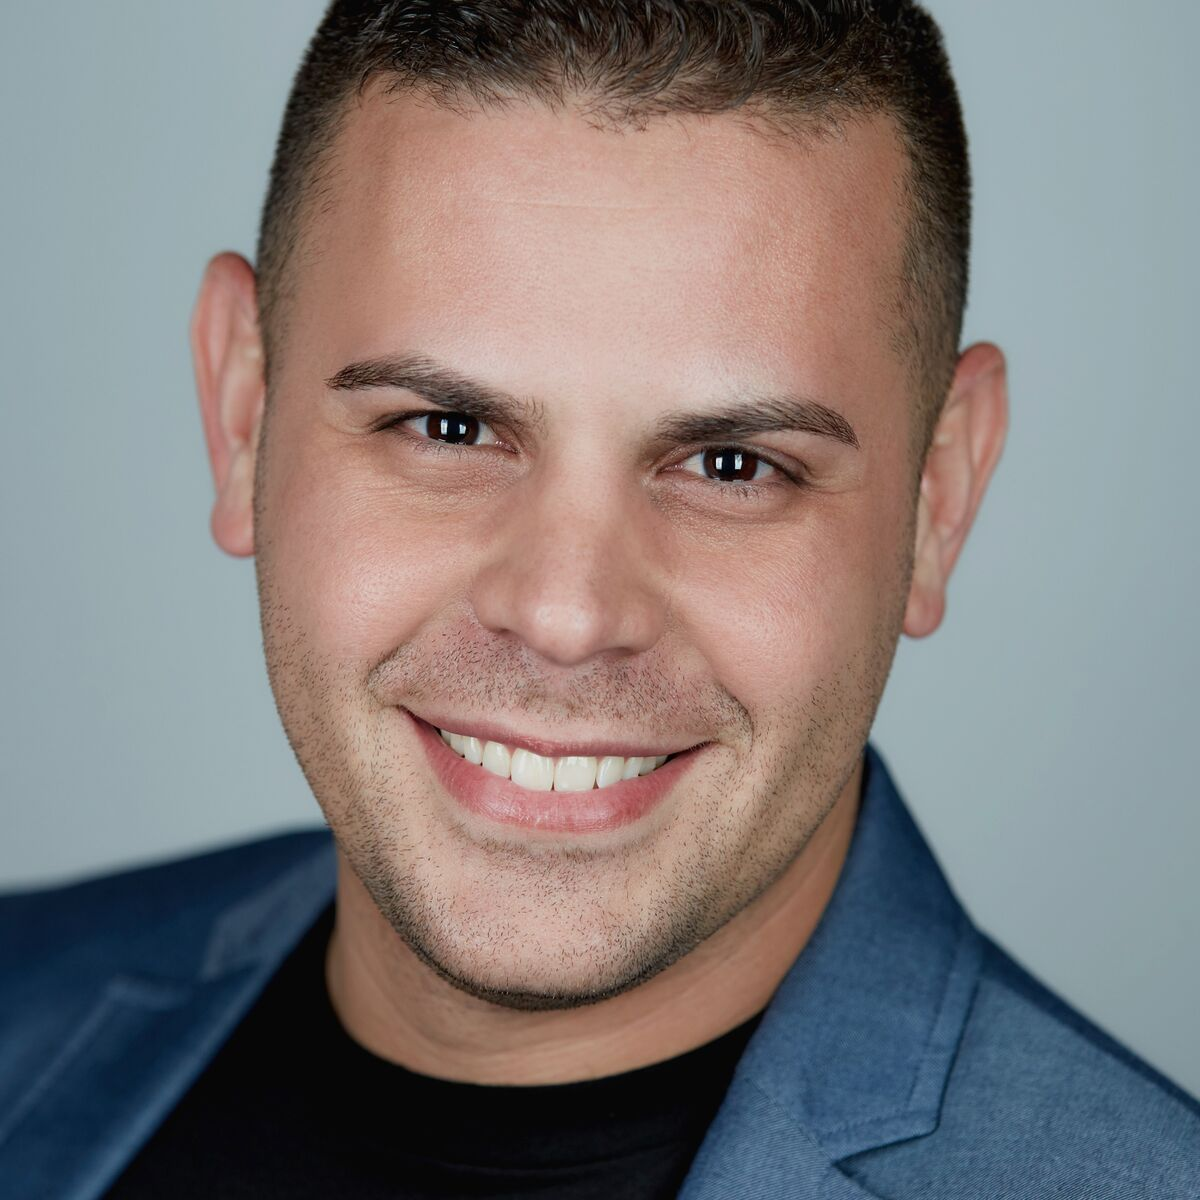 Carlos Vazquez Fiverr Pro seller||Fiverr Pro Ad campaign specialists||Fiverr Pro clickfunnels specialists||Fiverr Digital marketing conversion strategy Pro seller||Tharindu Gunawardana alias digitalministry, seo Pro seller on Fiverr